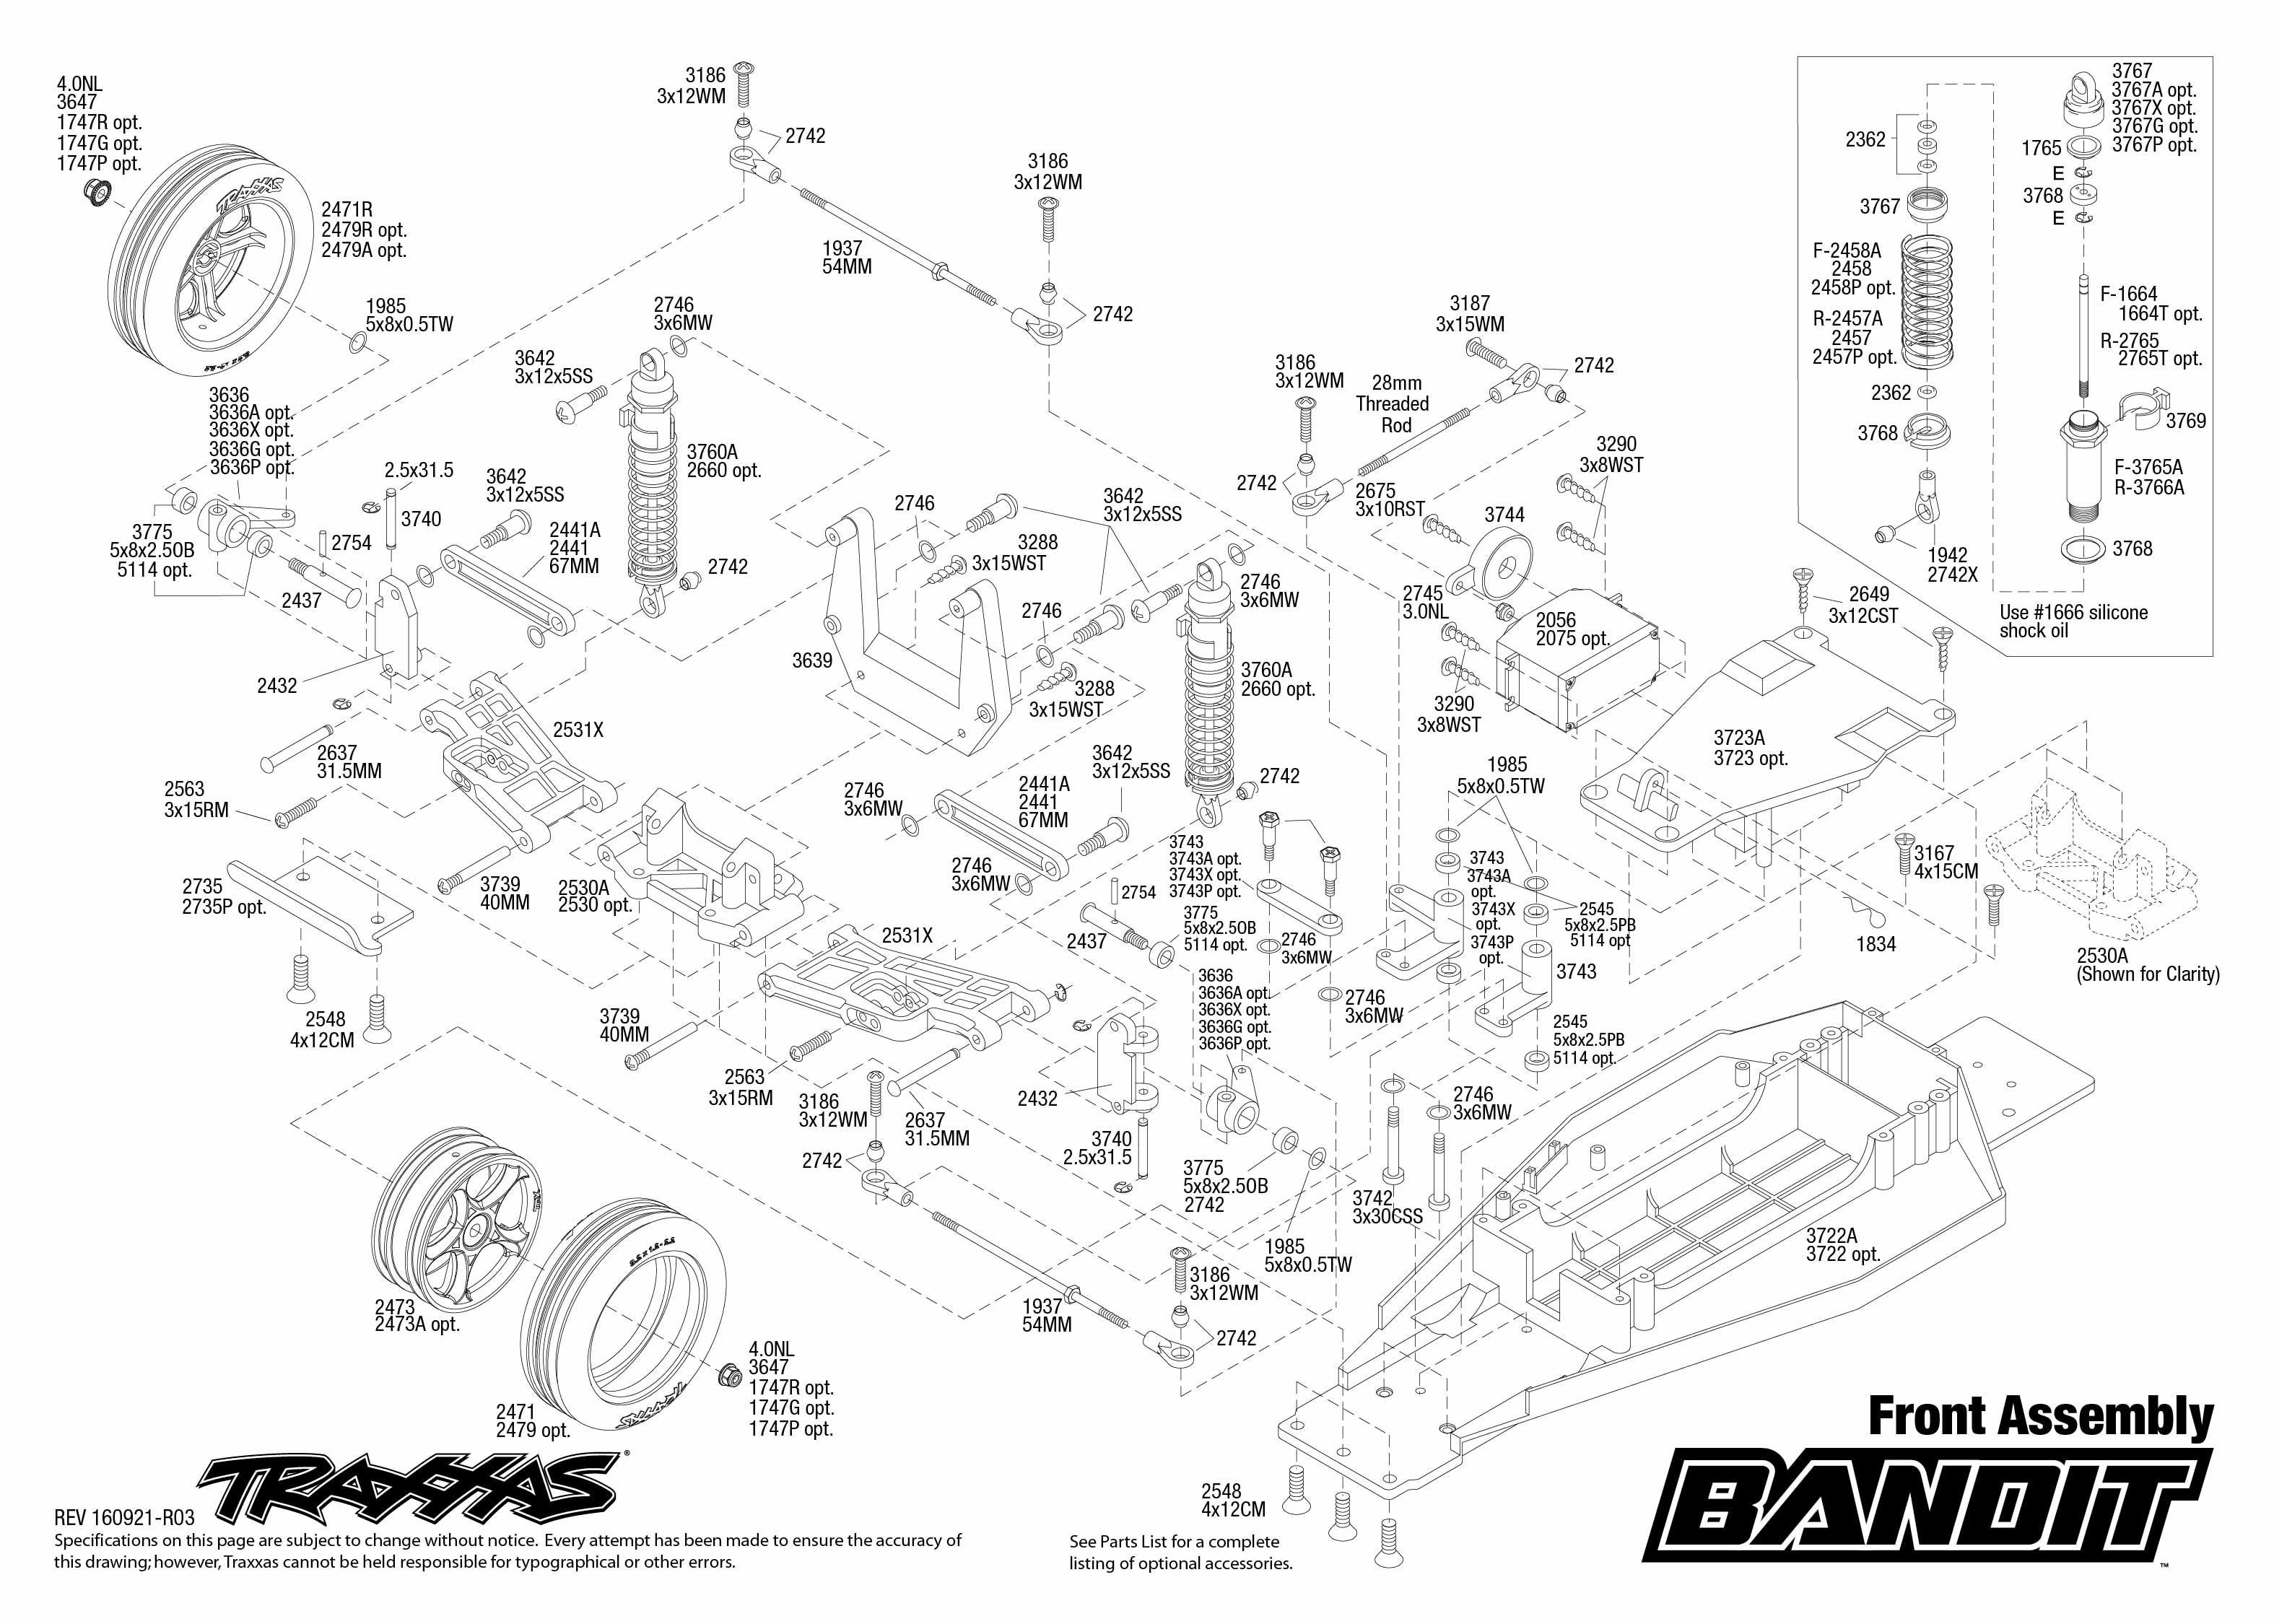 Magnificent Car Engine Parts List Wiring Diagram 1989 Toyota Corolla Sr5